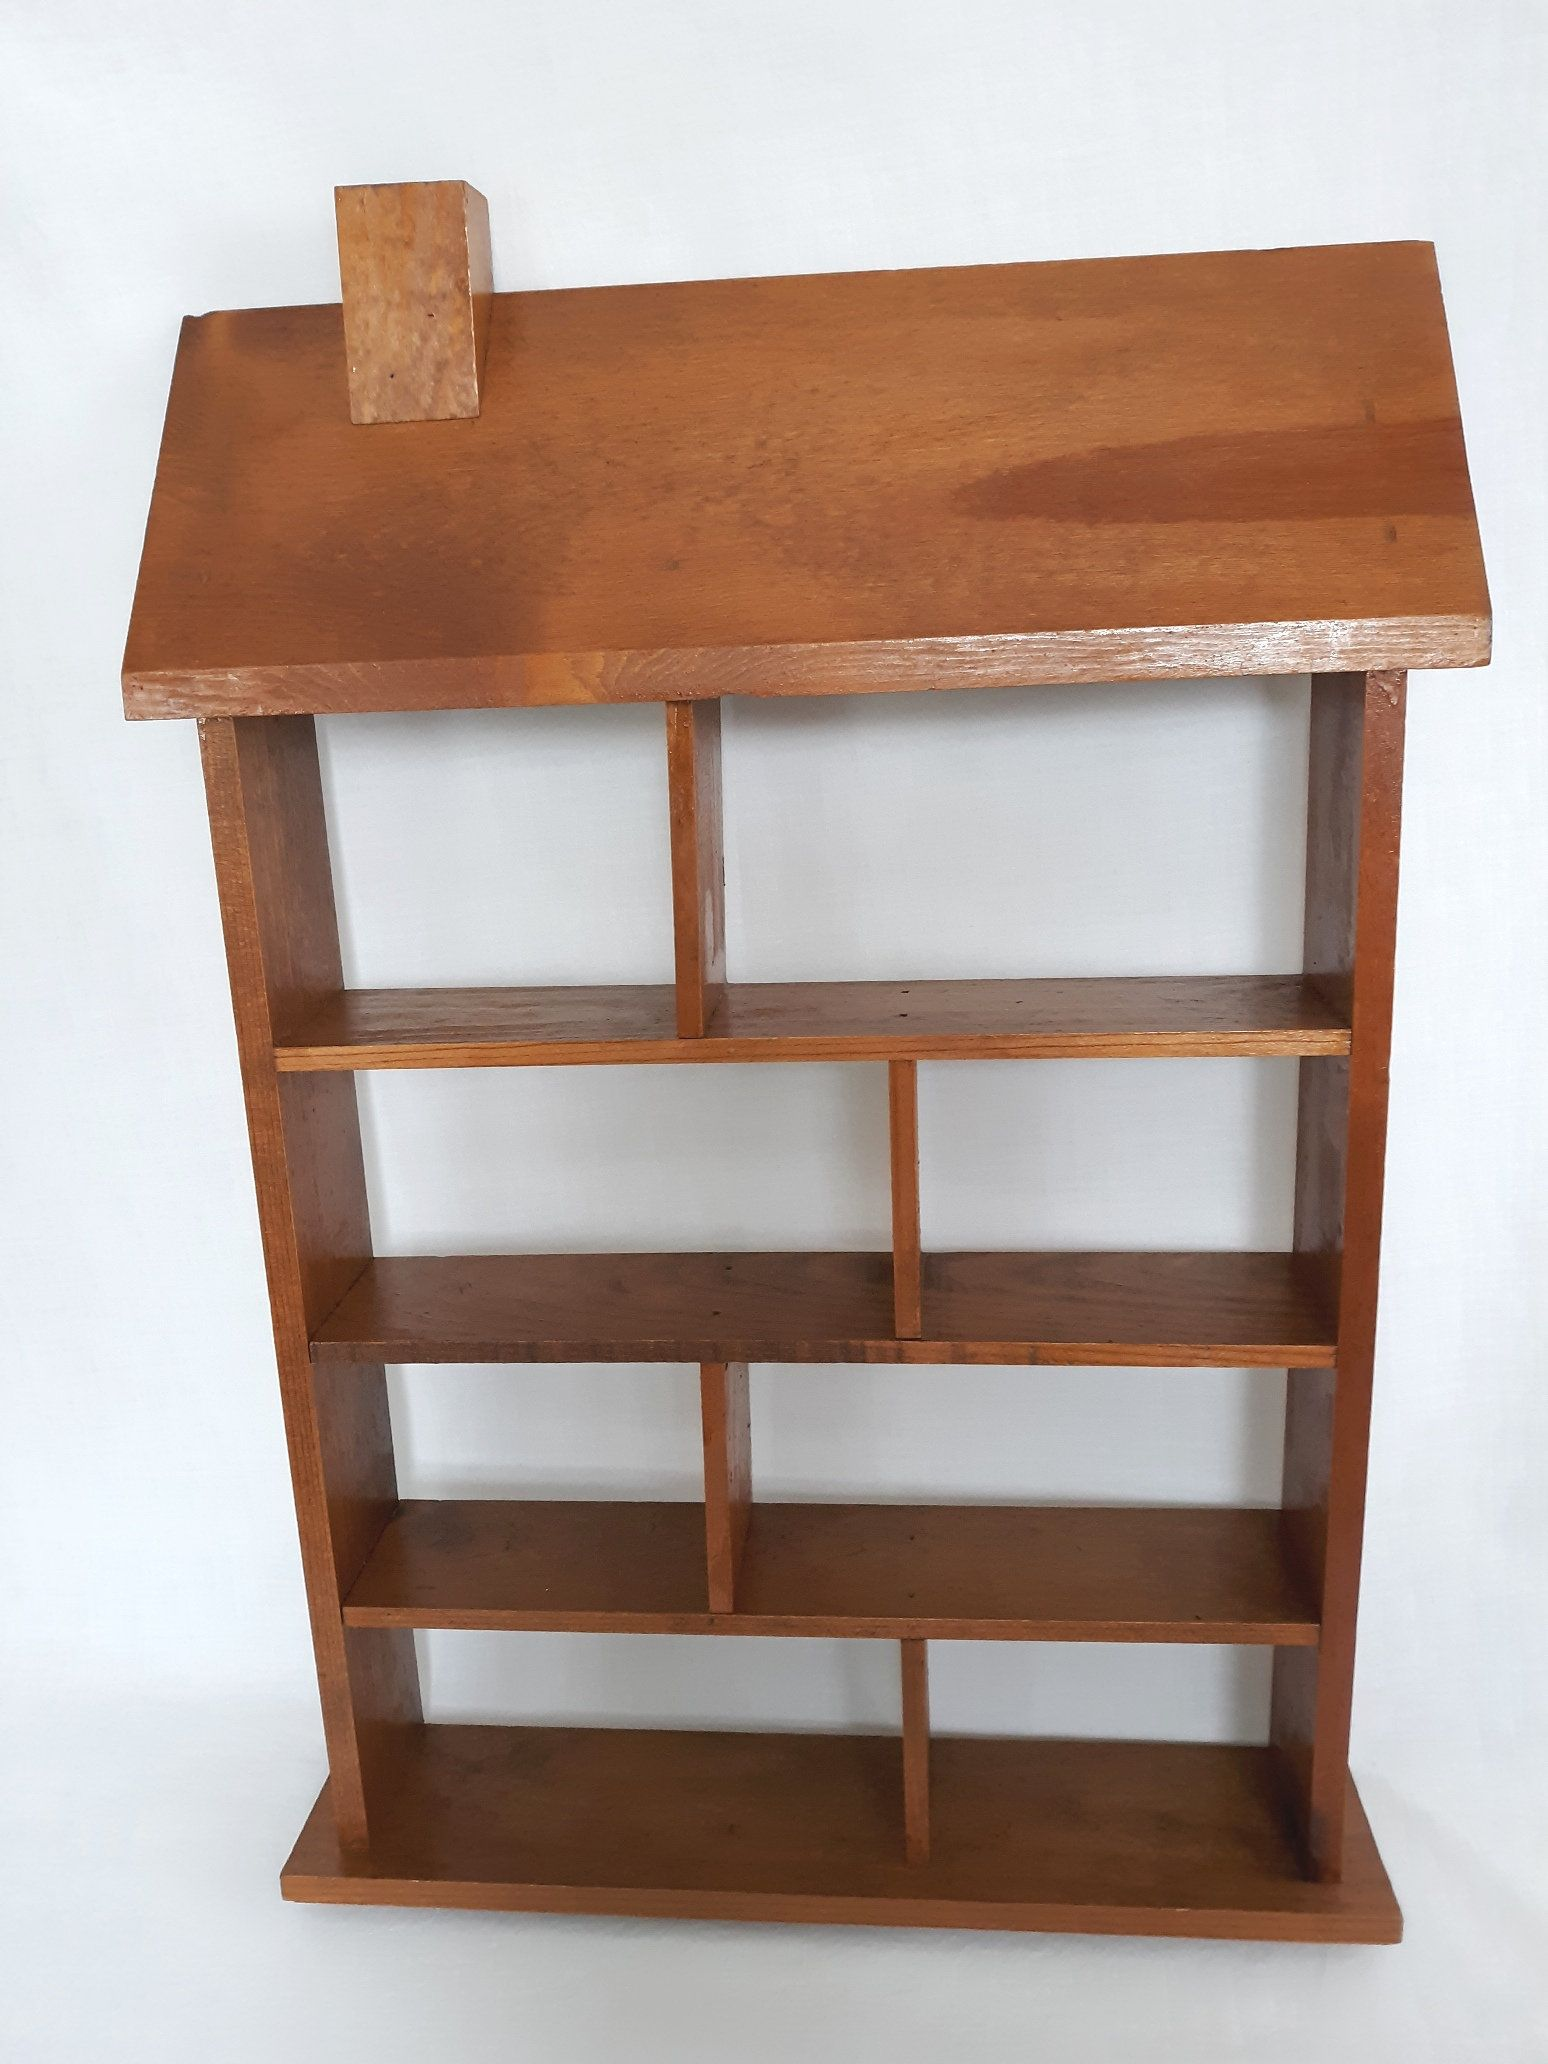 Vtg Hdm Wooden Tall Shelf Mini Collections Organizer Rack Spice Holder Knick Knacks Open Display House Shaped Wall Hanging Tall Shelves Shelves Wooden Shelves